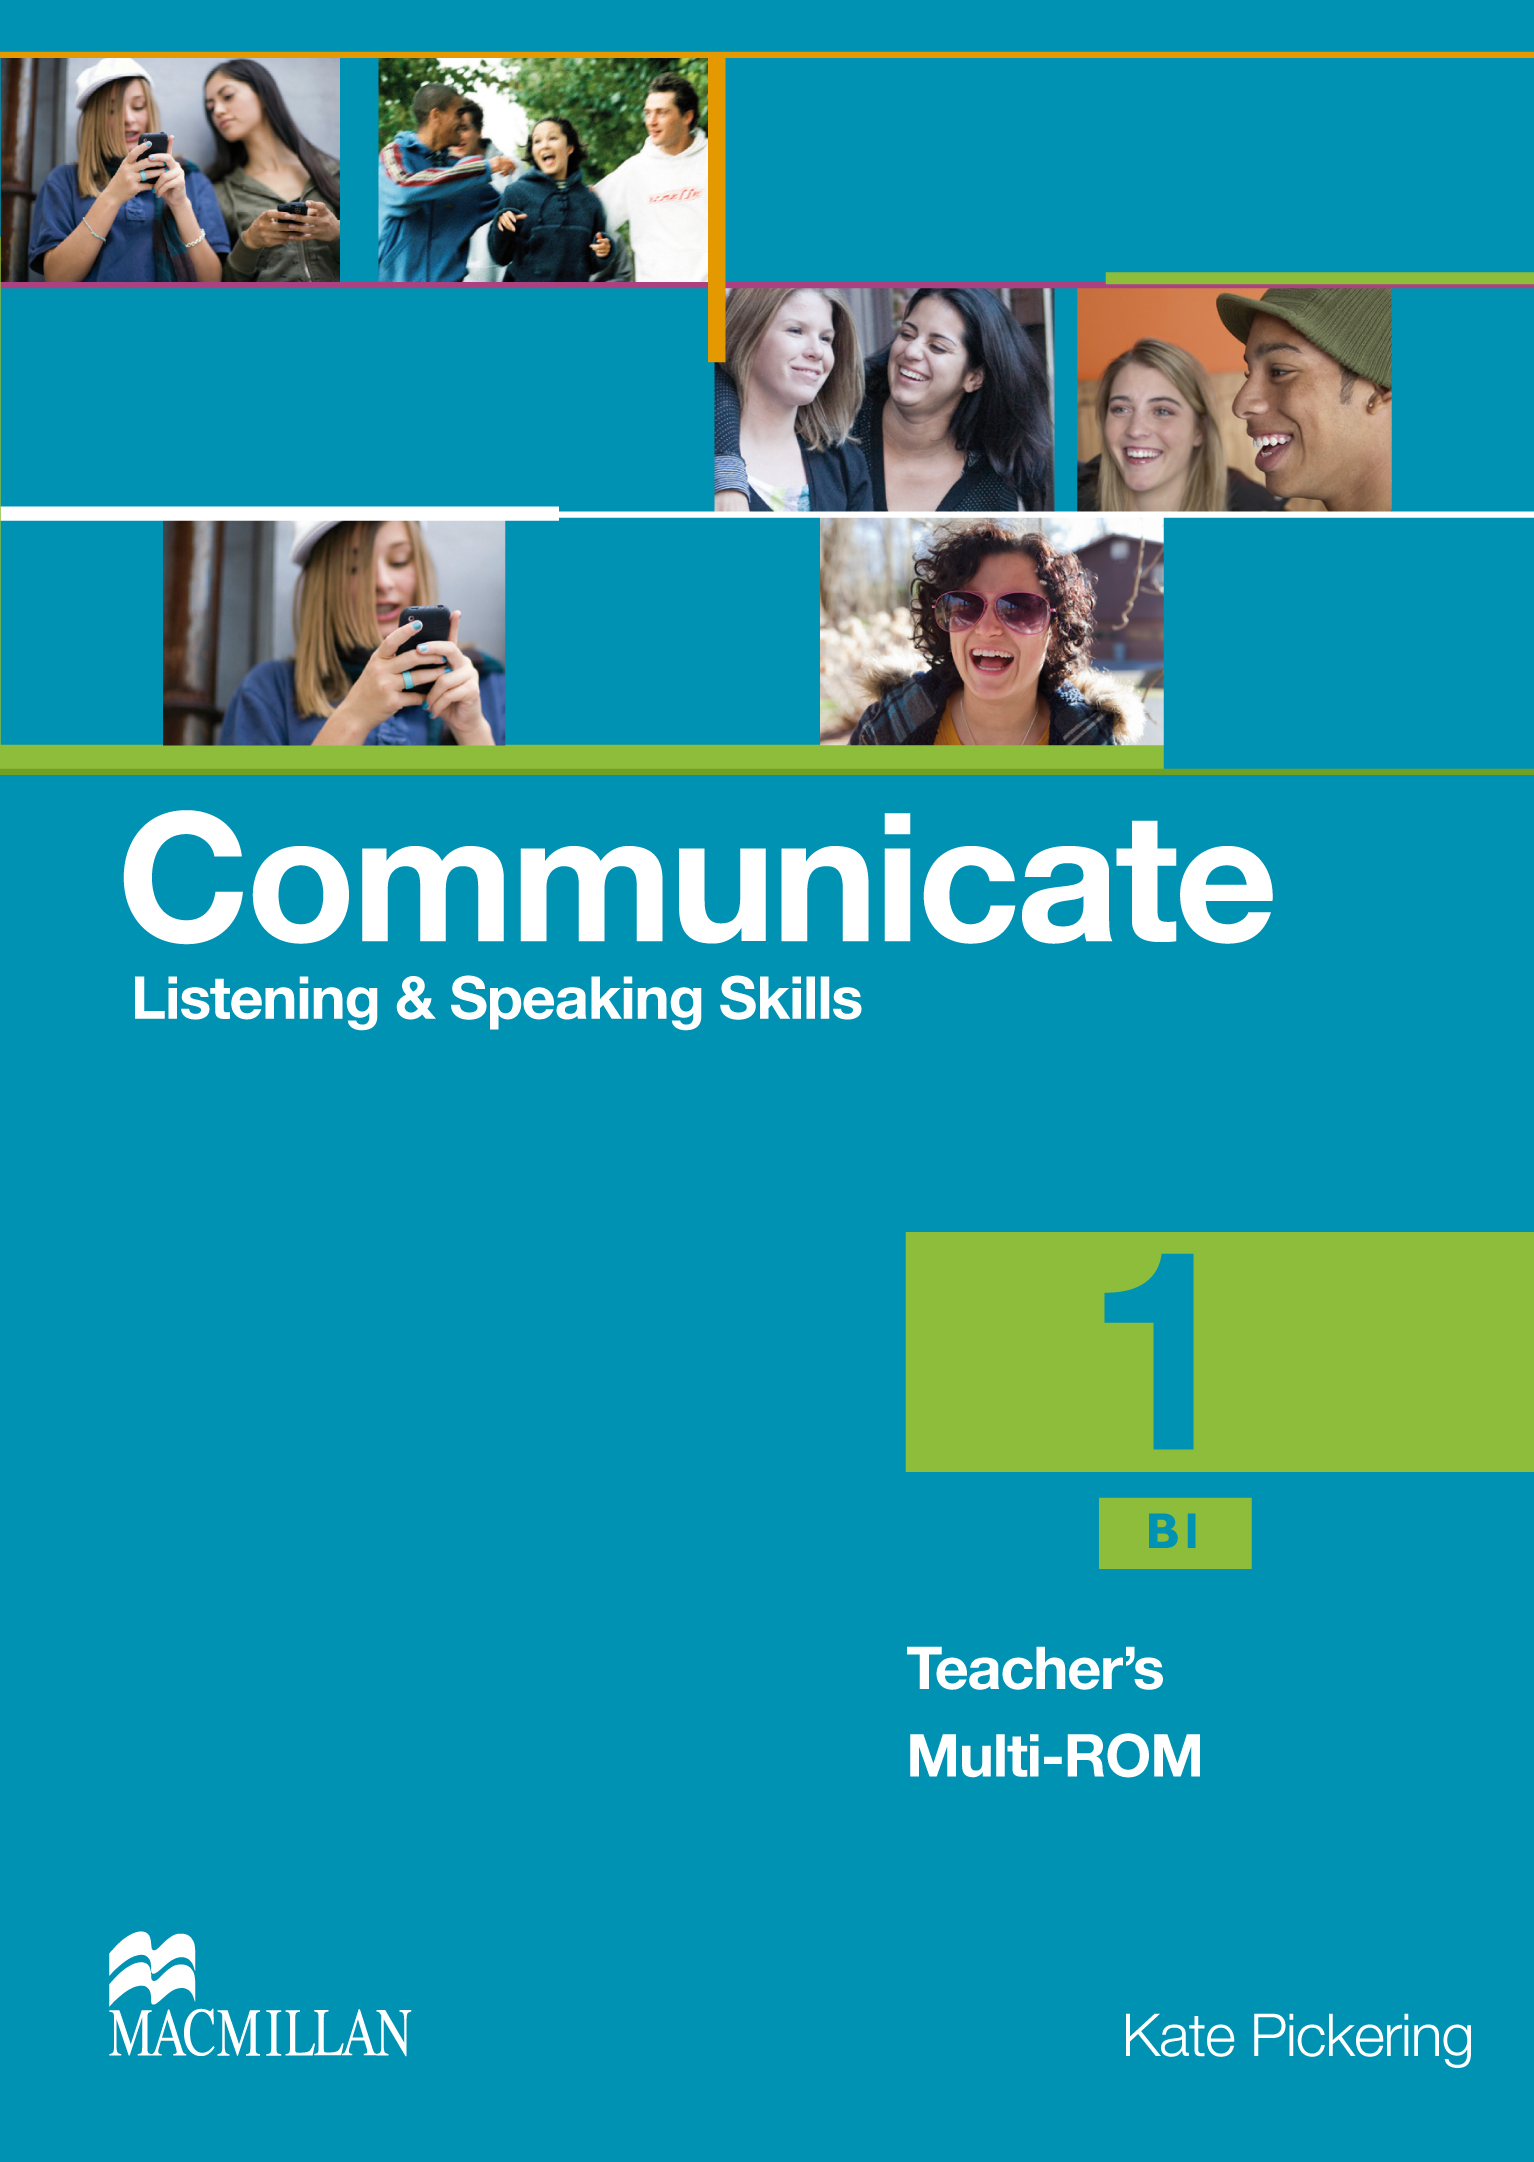 Communicate Teacher